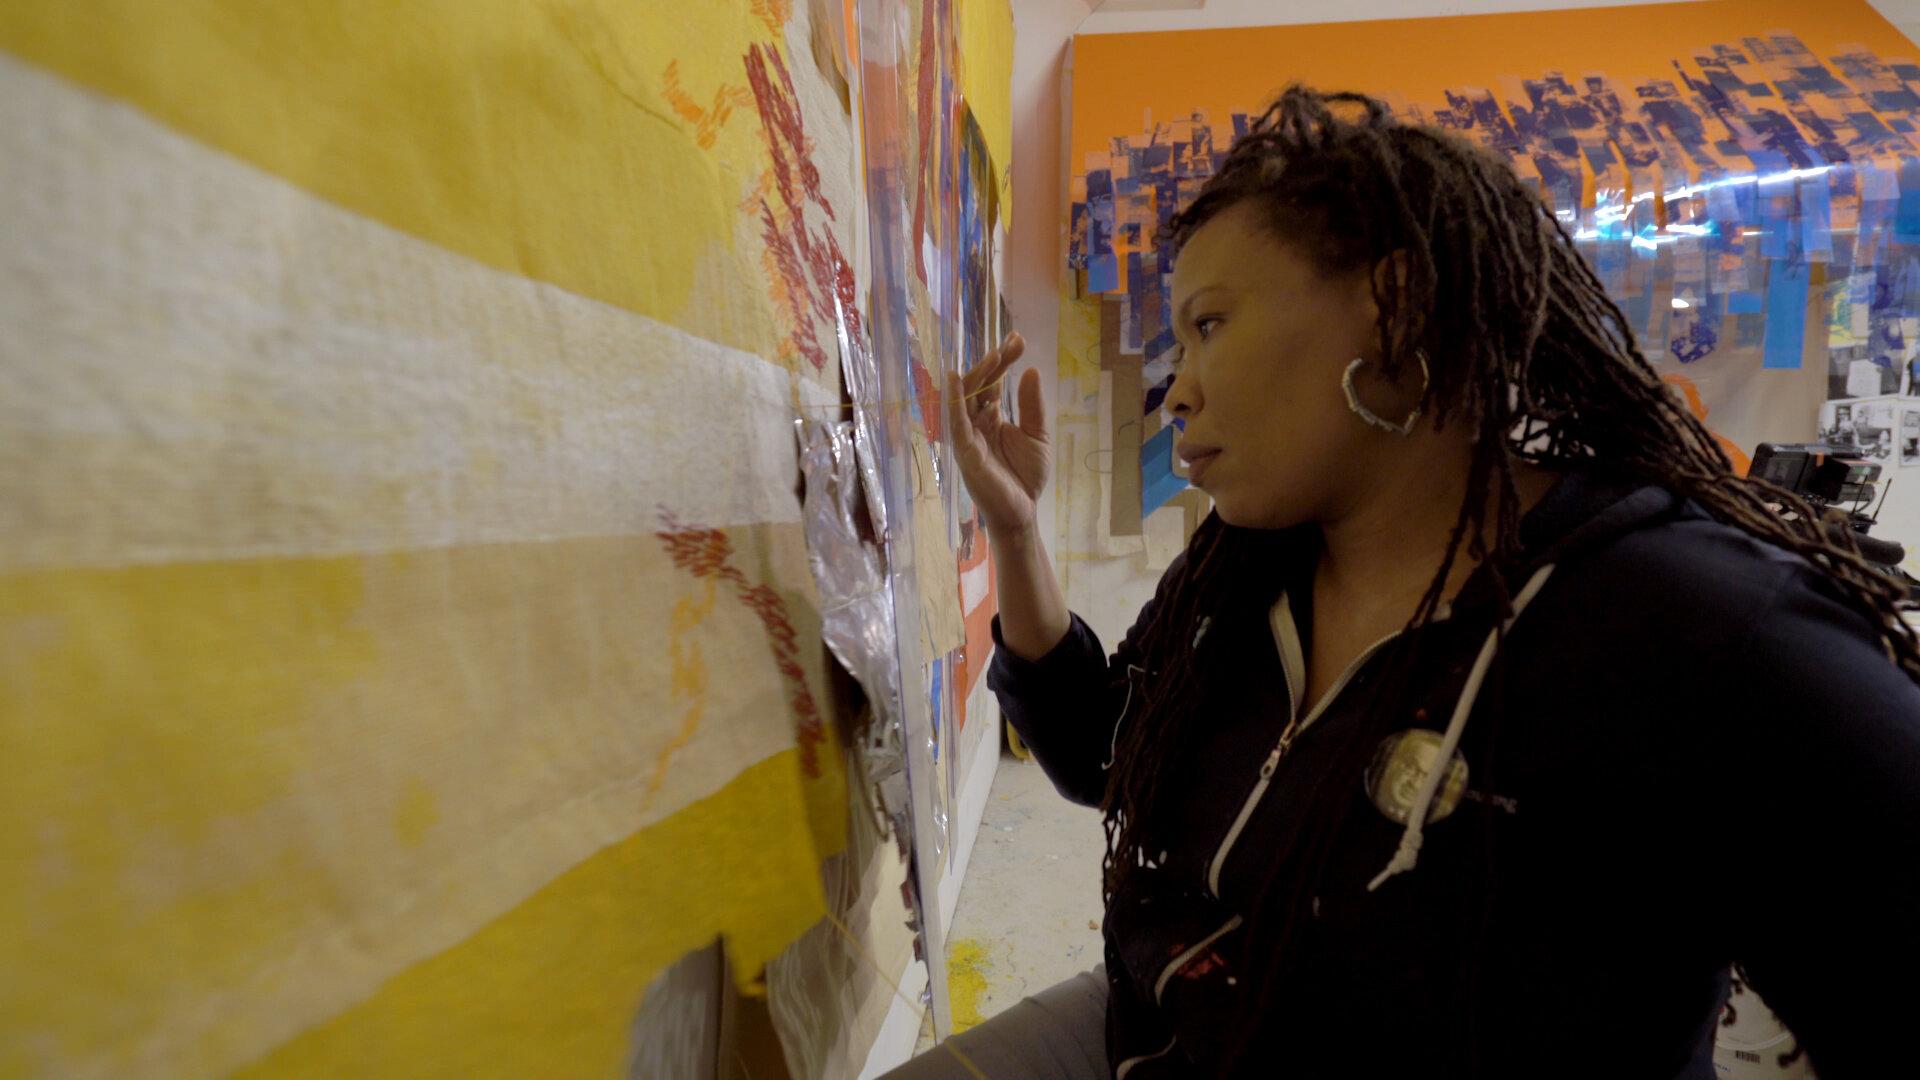 Whitney_Biennial_2019_Tomashi_Jackson_20190610_EXPORT_v05_FINAL.00_04_21_19.Still020.jpg